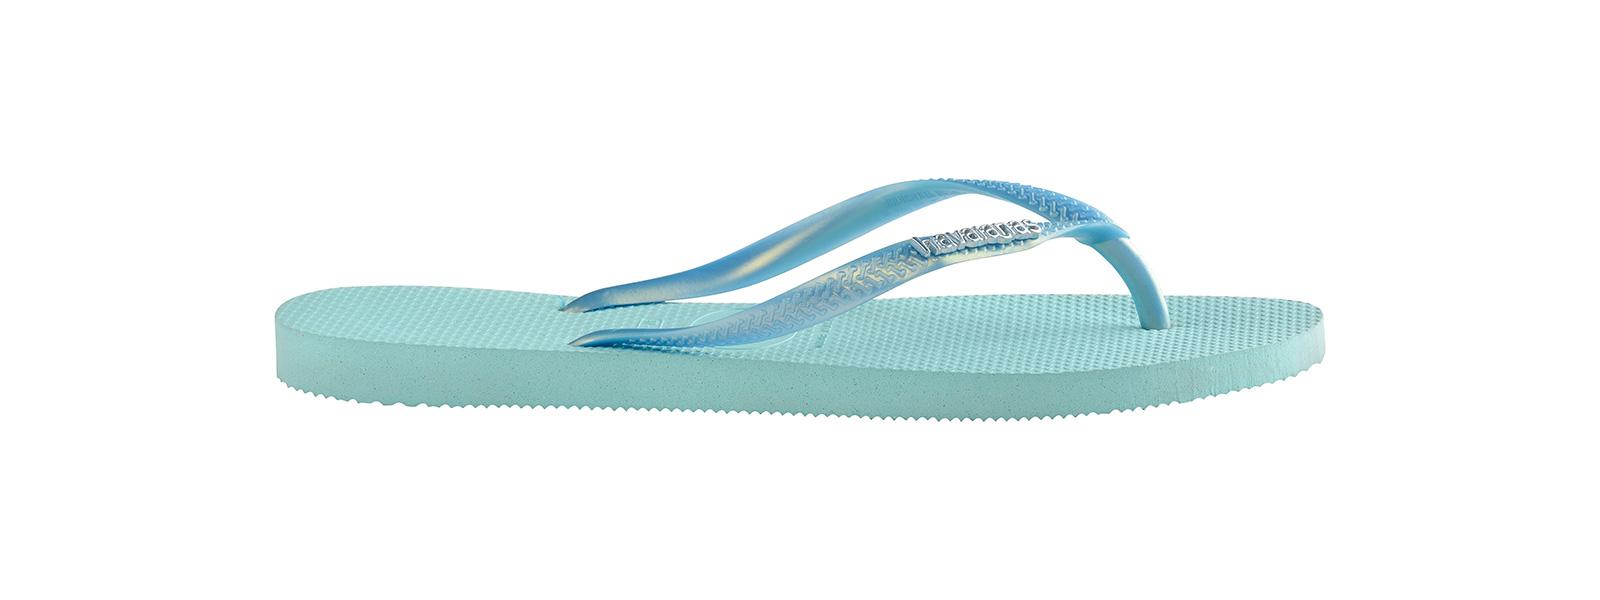 a2c603762 Flip-Flops Flip-flops - Havaianas Slim Logo Metallic Ice Blue